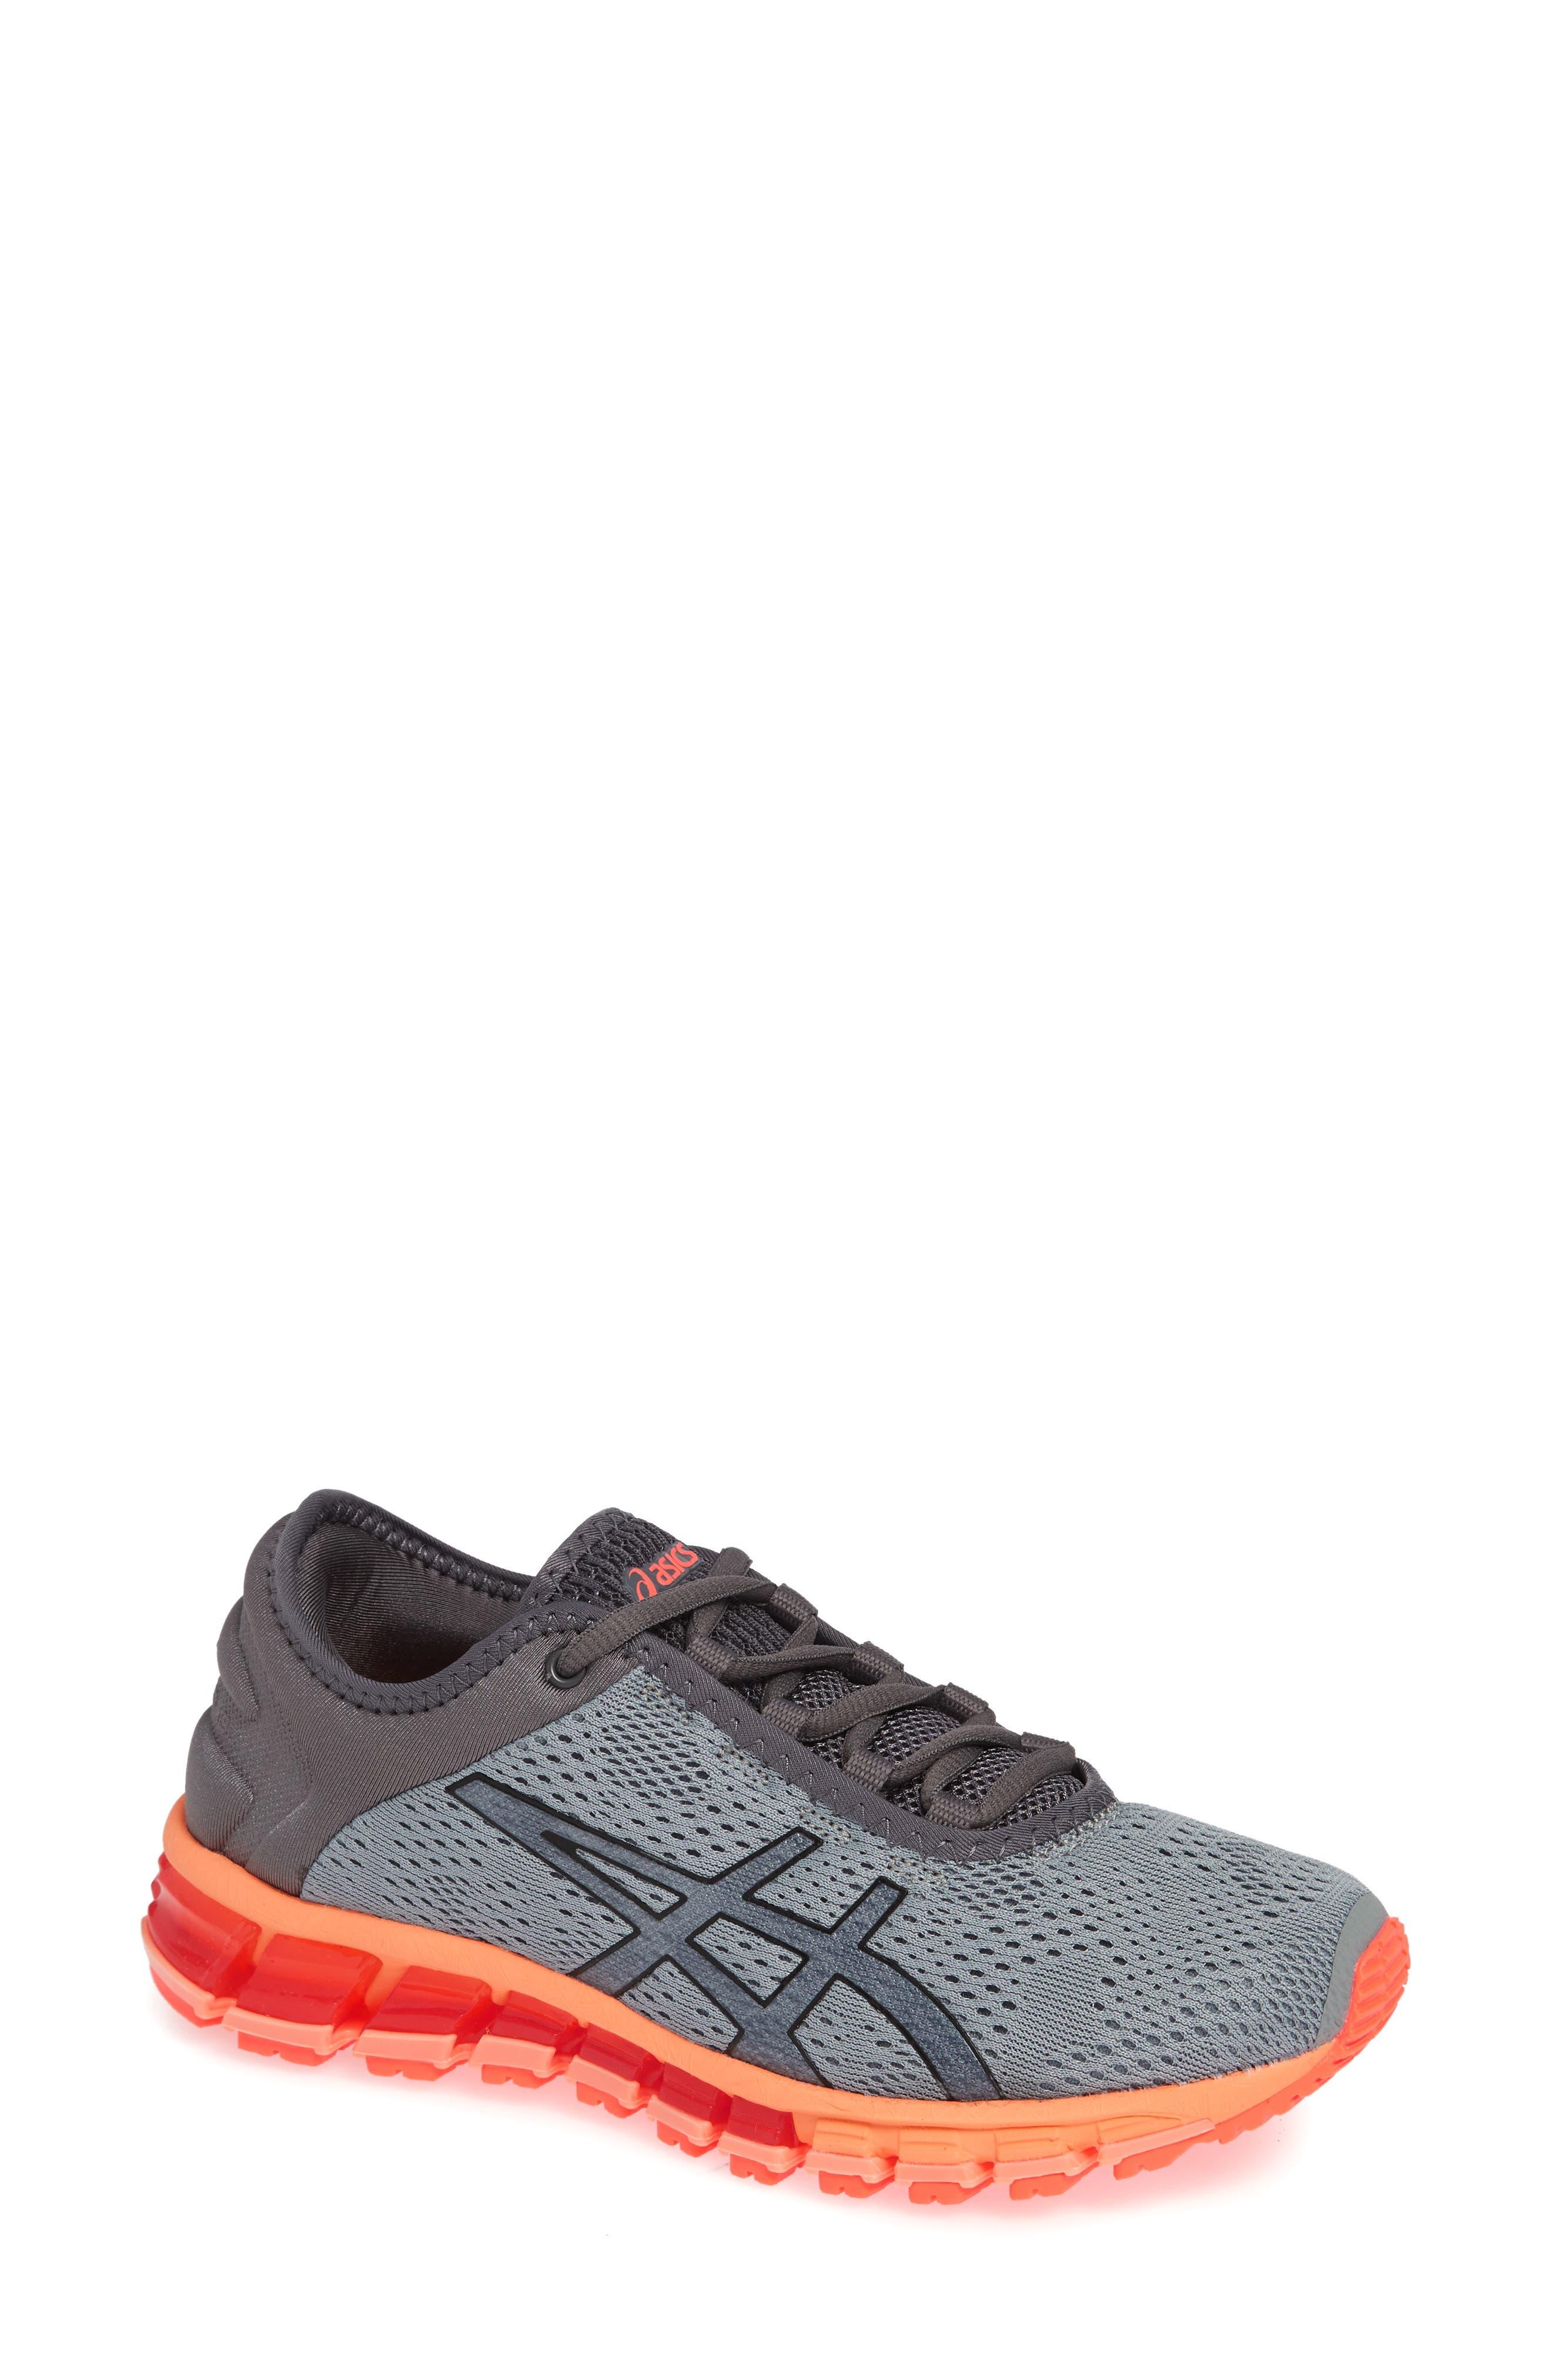 GEL Quantum 180 3 Running Shoe,                         Main,                         color, STONE GREY/ CARBON